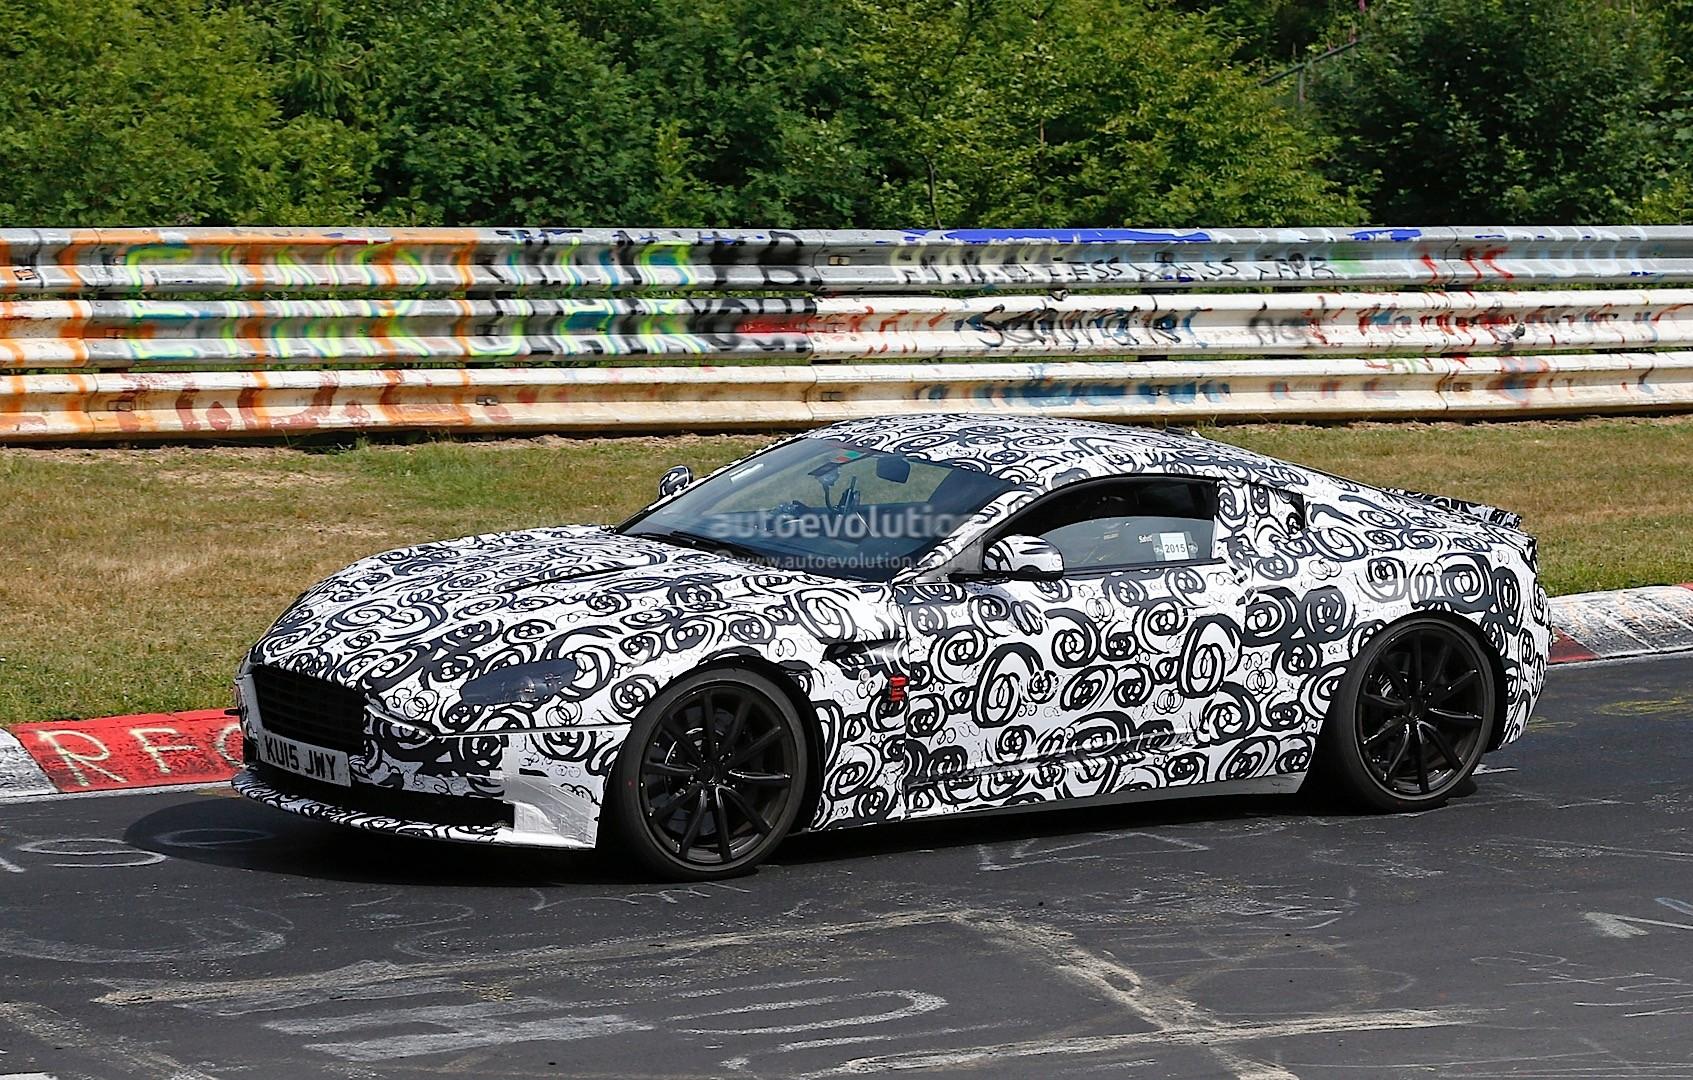 2016 - [Aston Martin] DB11 New-aston-martin-db11-prototype-looks-like-a-work-in-progress-photo-gallery_7